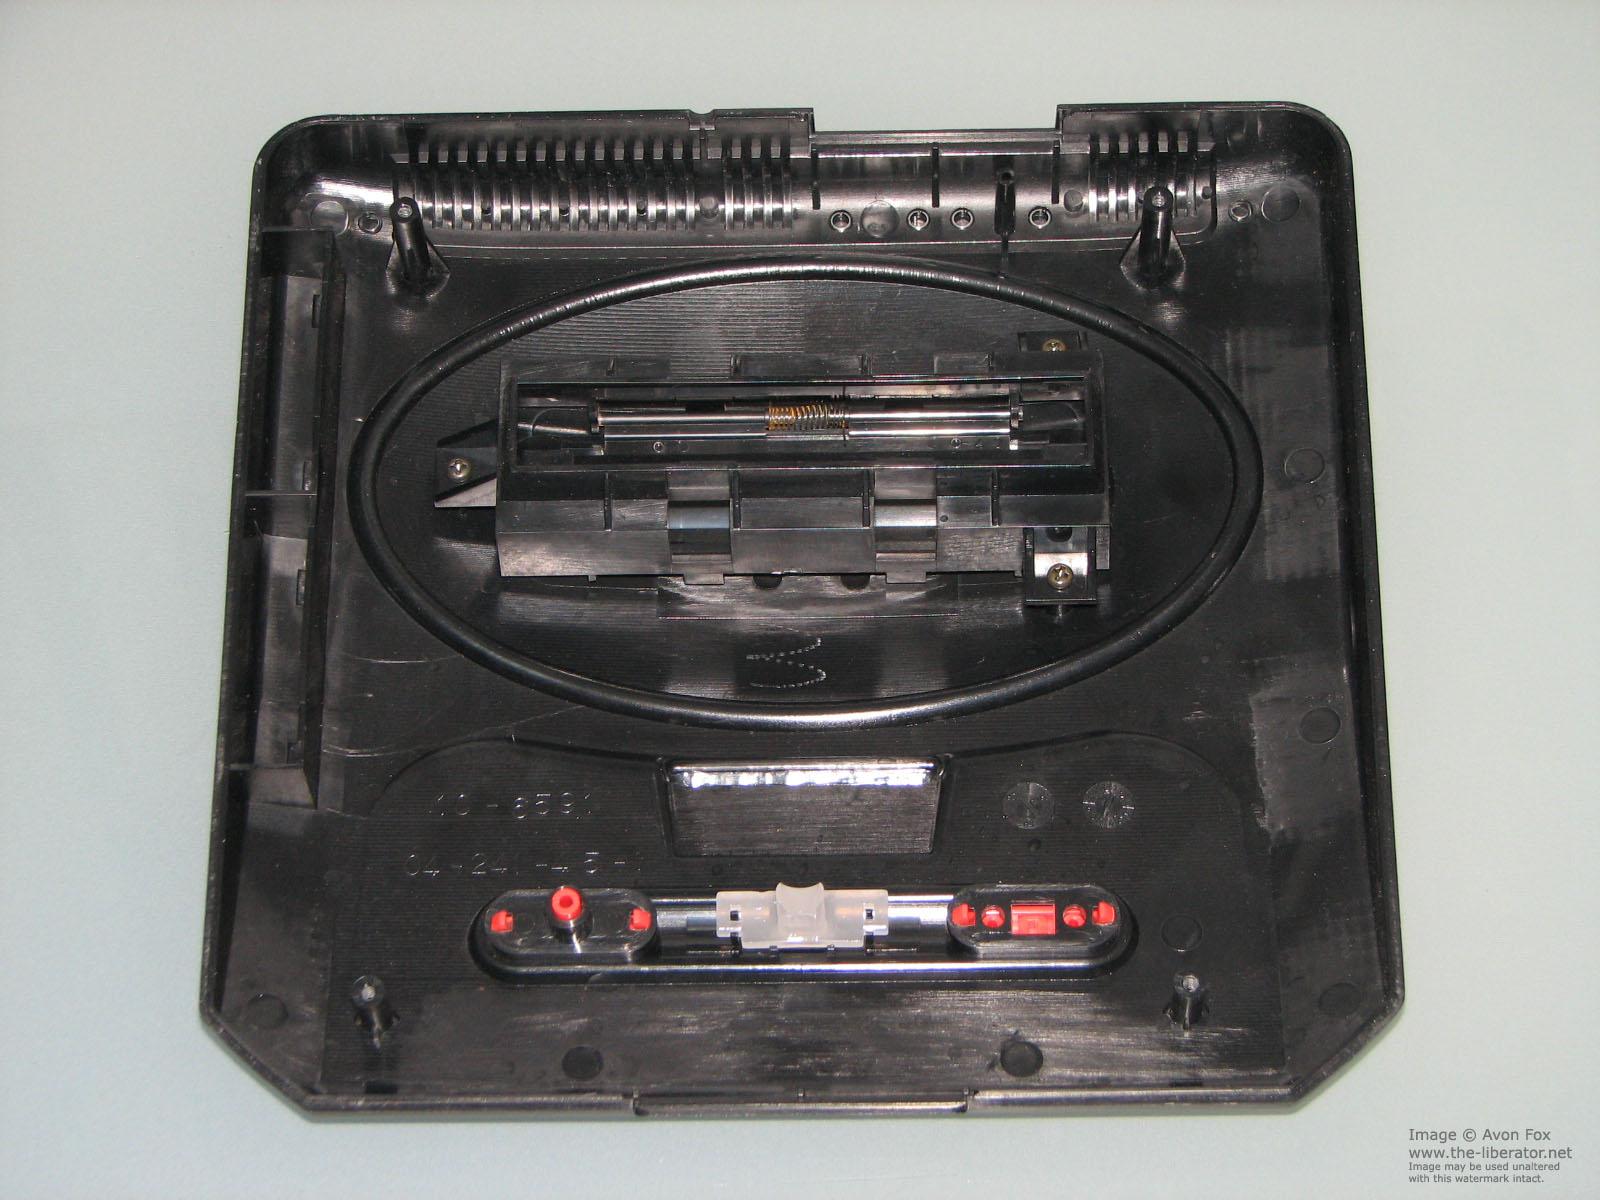 SEGA Mega Drive II 2 / Genesis II 2 Malaysian PAL Version megadrive